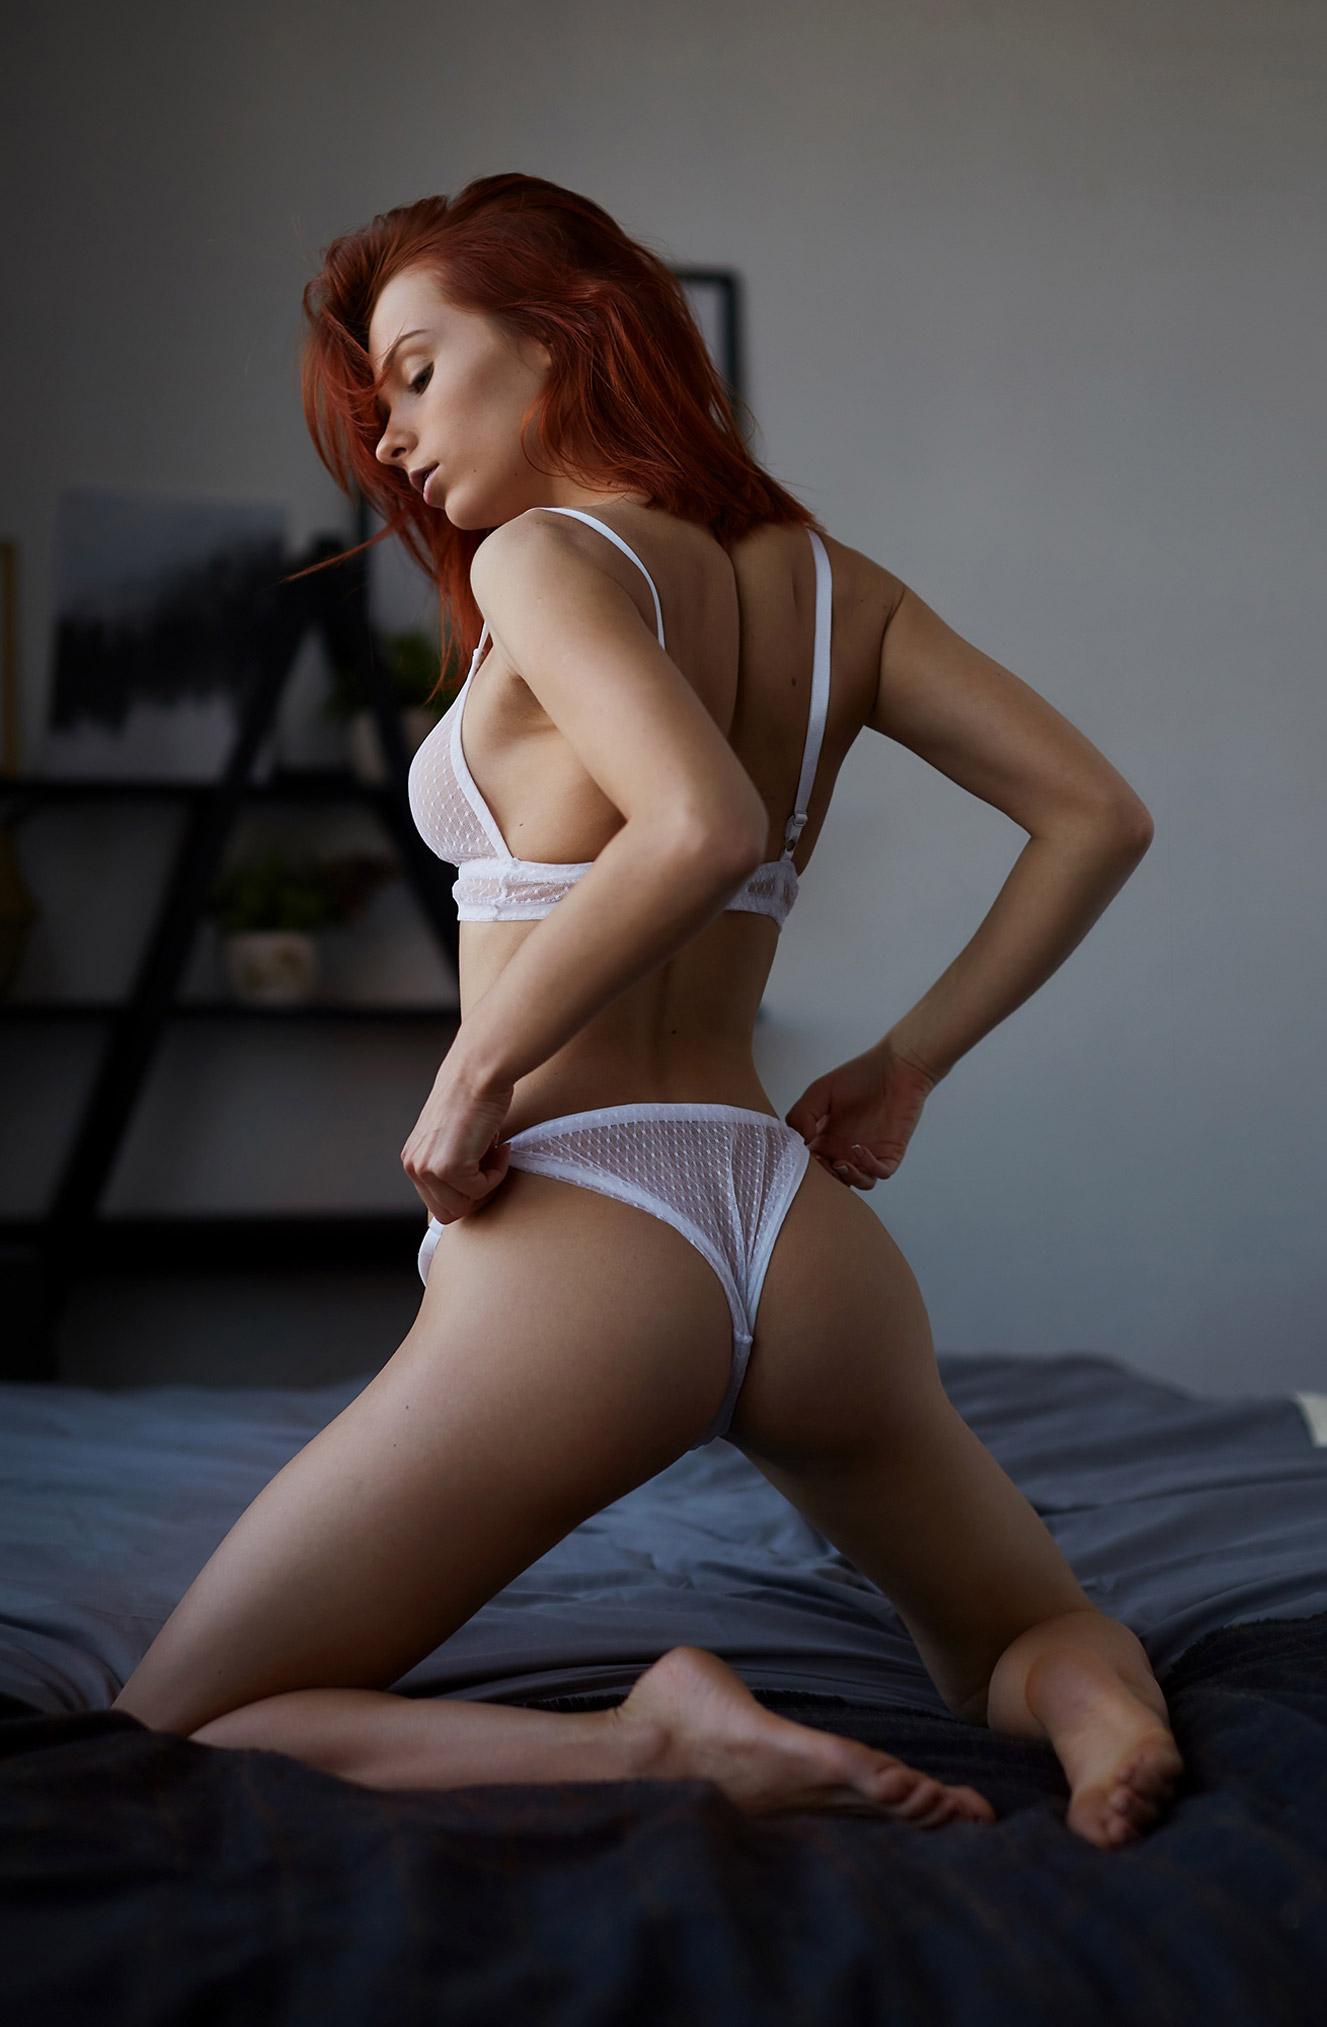 Марта Громова, фотограф Дмитрий Лобанов / фото 03